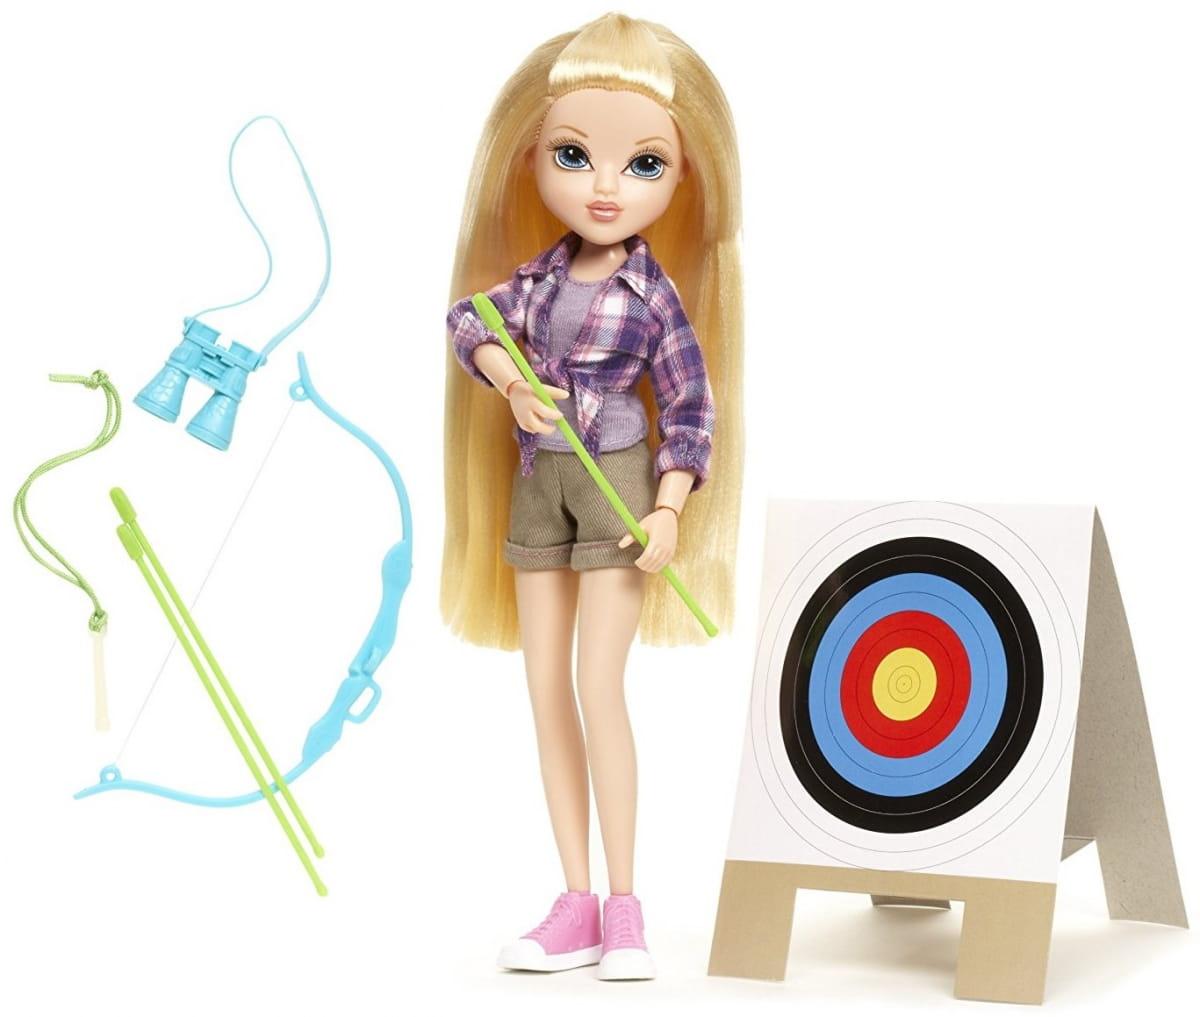 Кукла Moxie 528951 Юные скауты - Эйвери